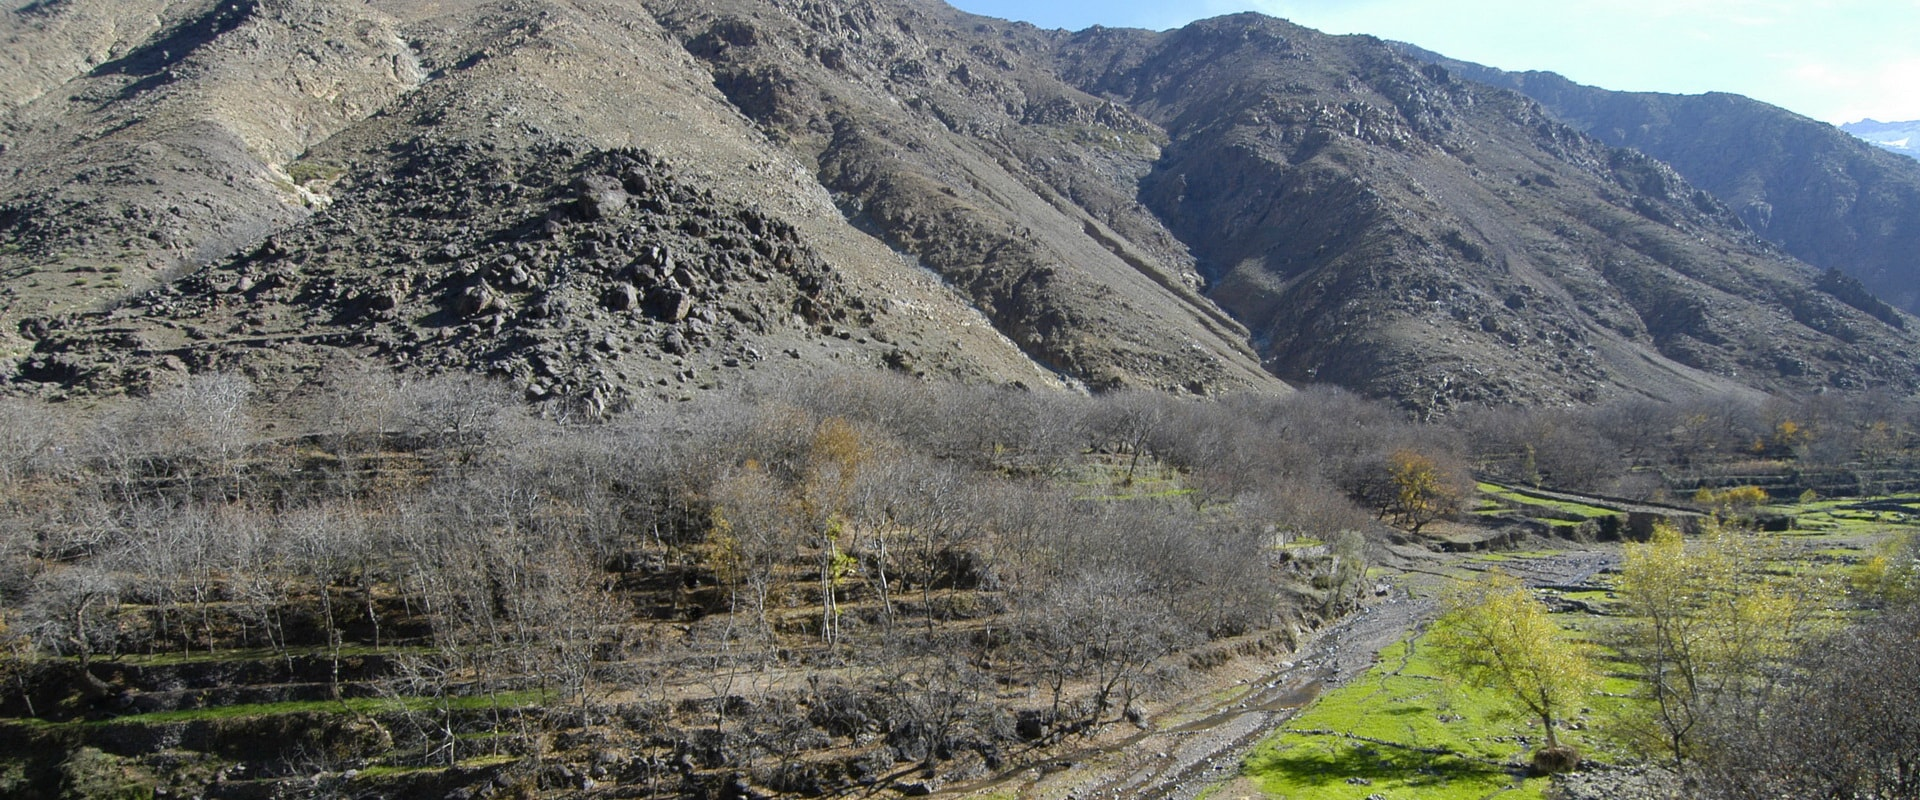 Voyages Expeditions Maroc - excursion vallee d'imlil en famille